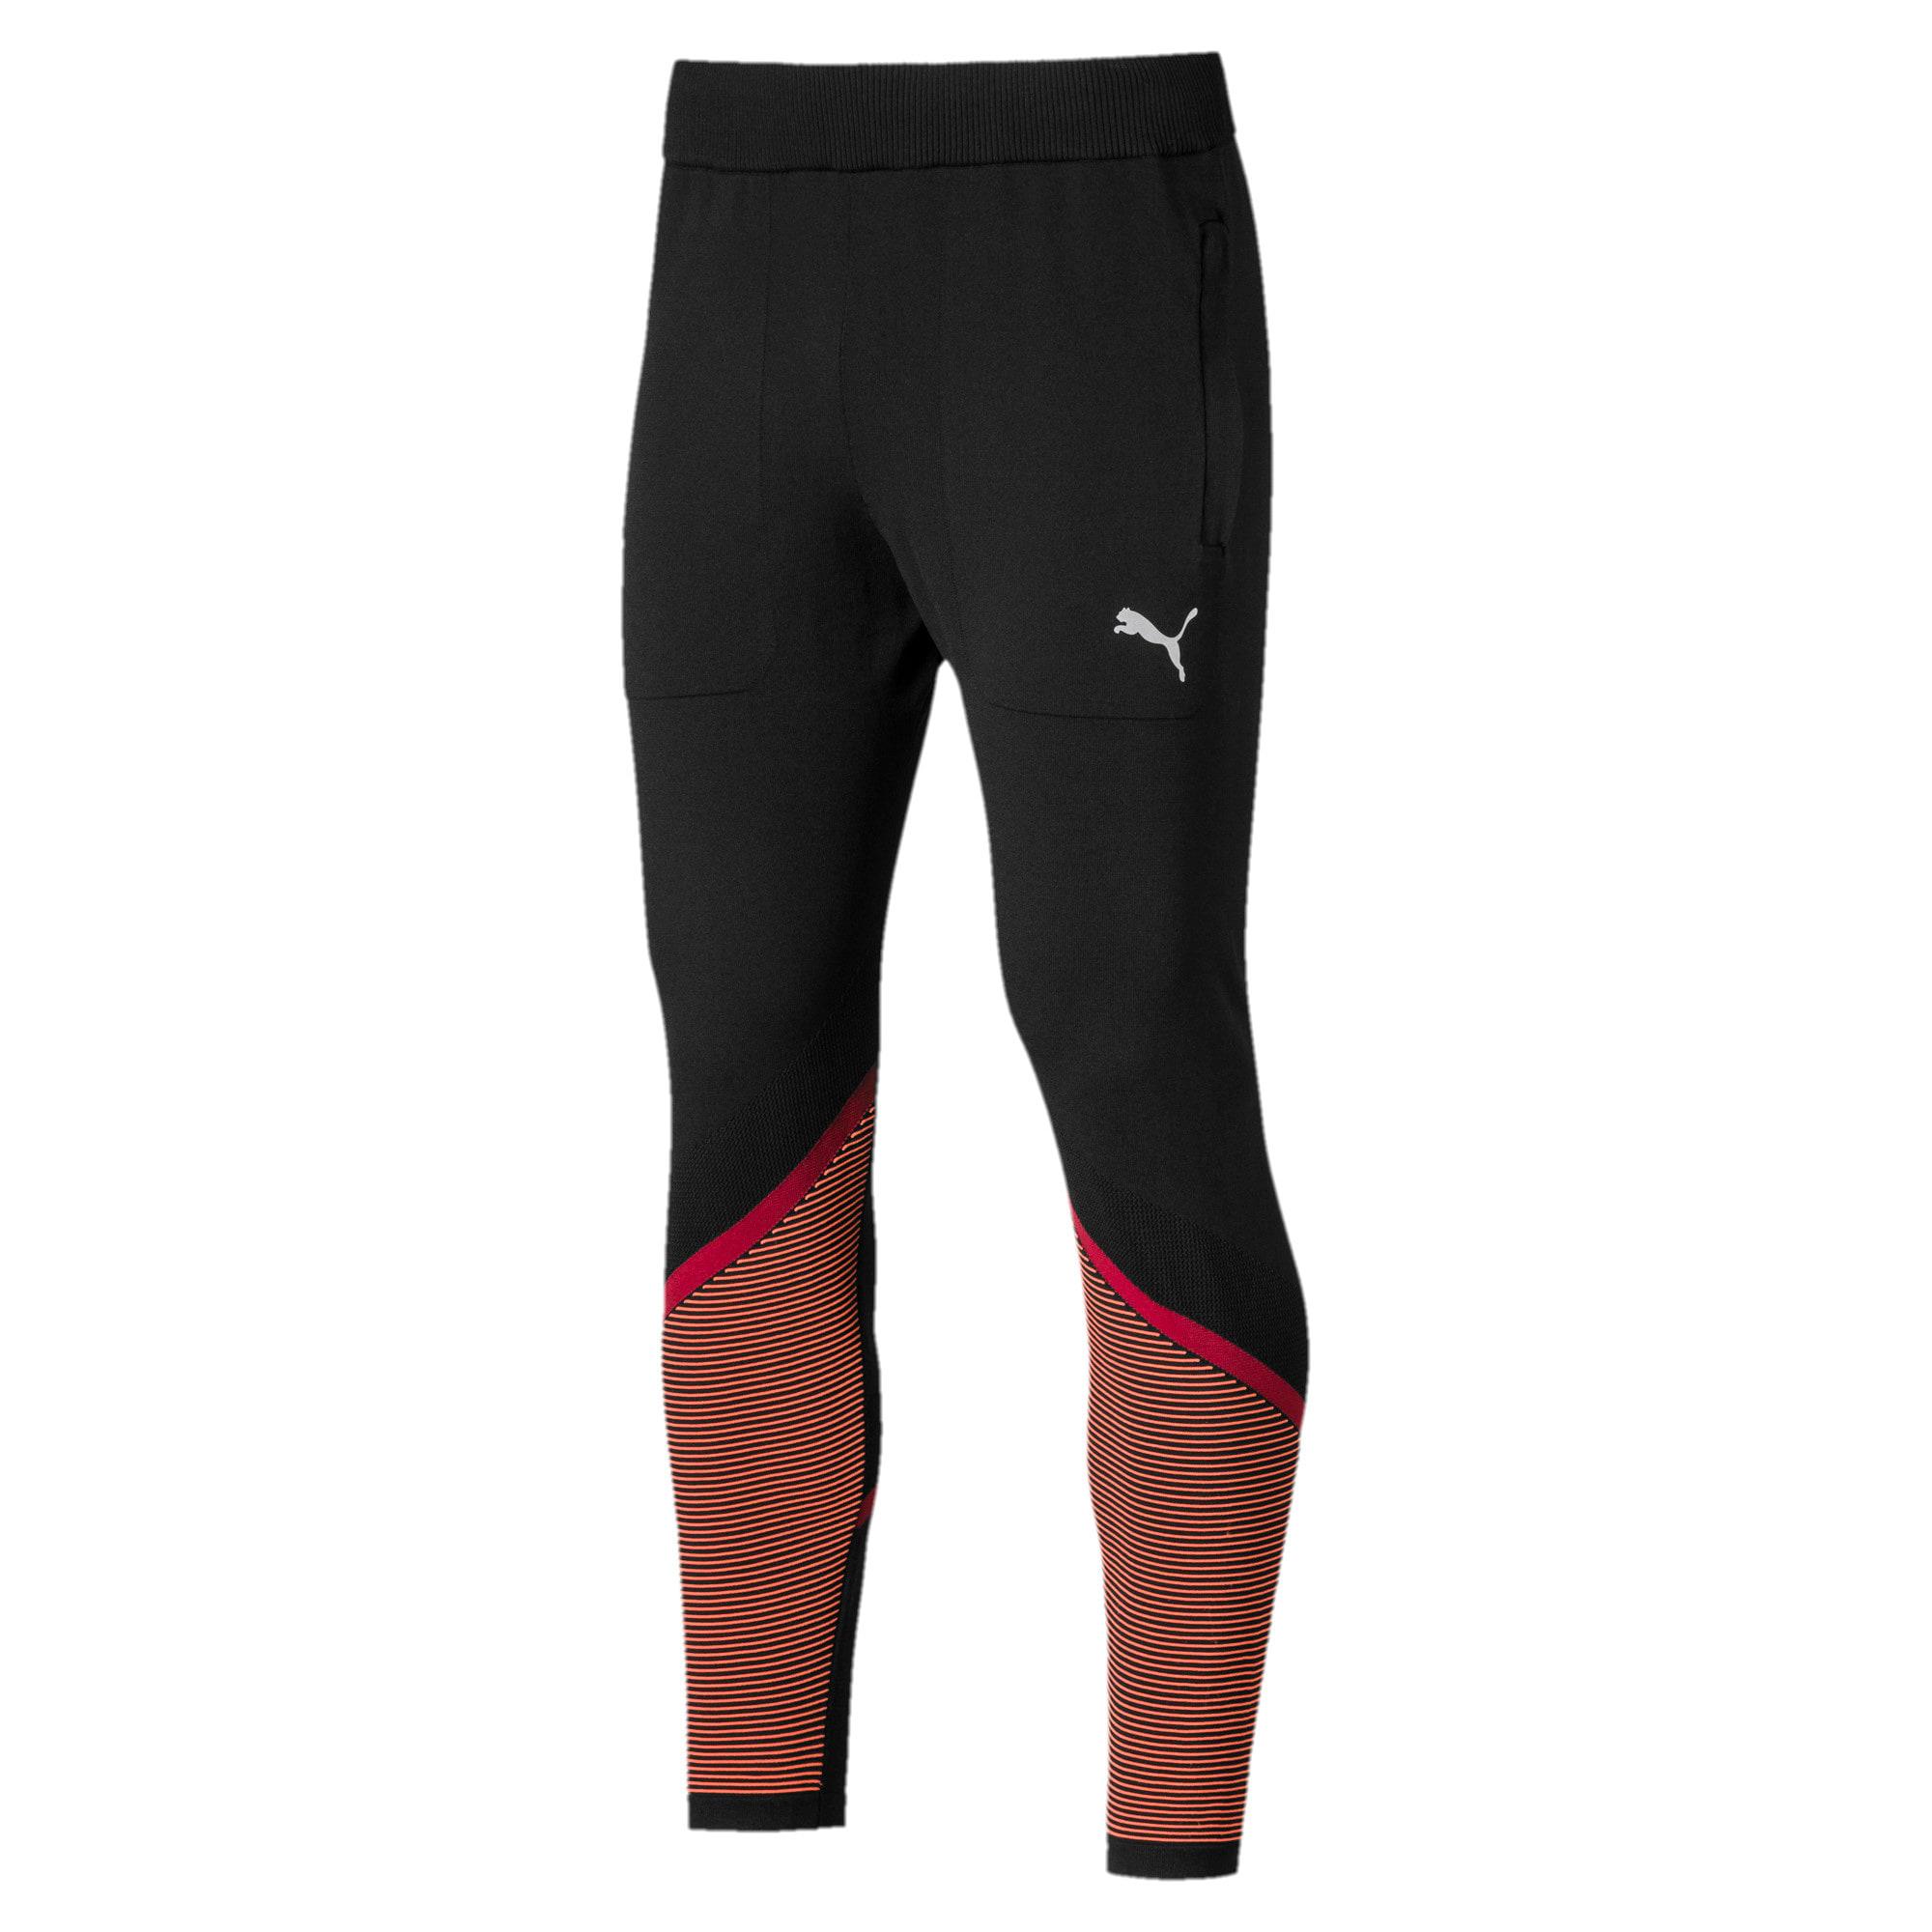 Miniatura 4 de Pantalones Reactive evoKNIT para hombre, Puma Black-Rhubarb, mediano